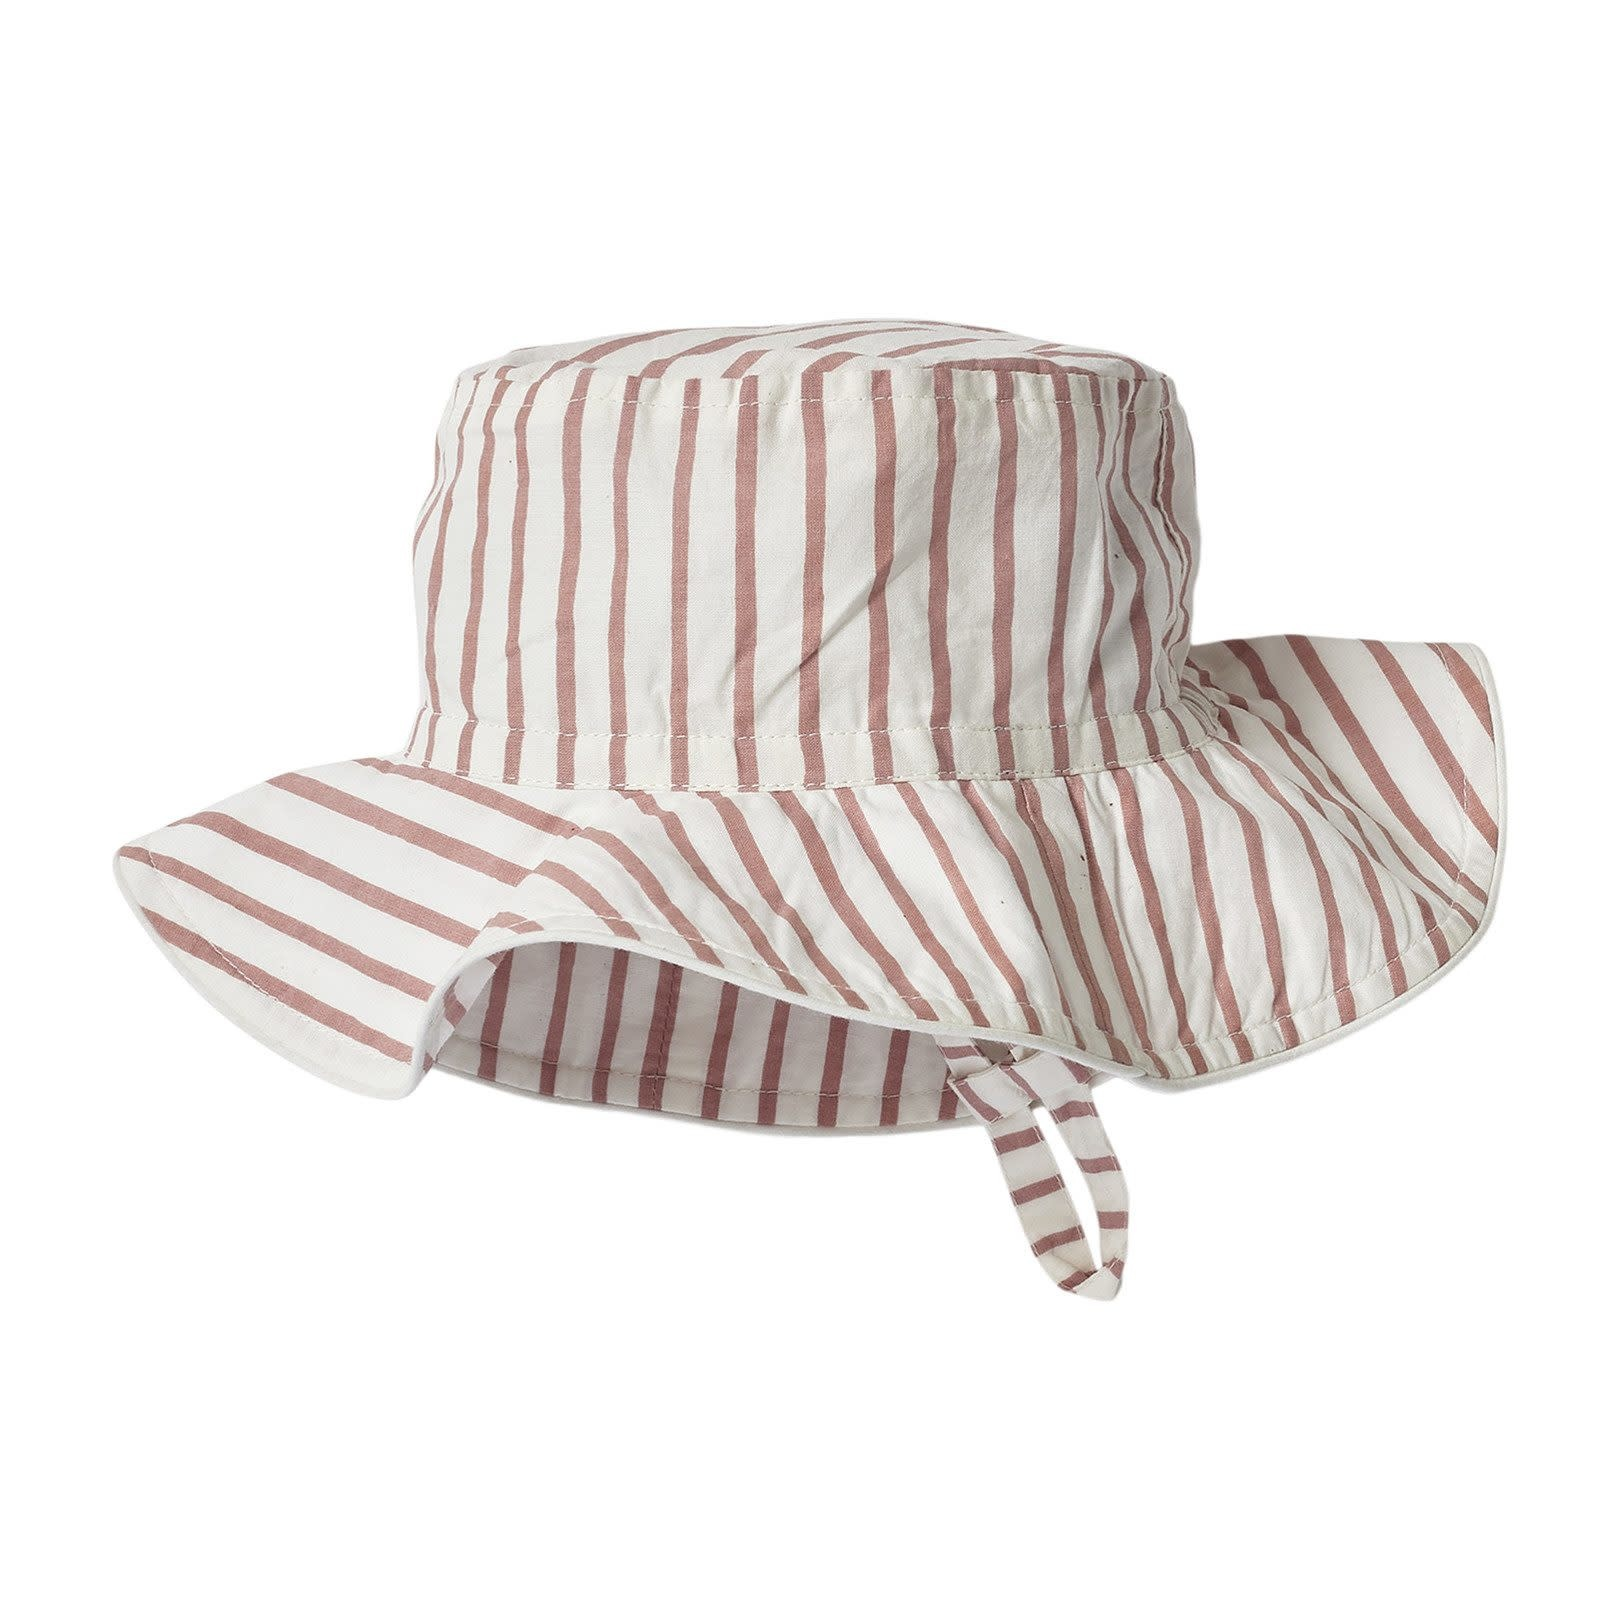 Pehr Designs Bucket Hat Stripes Away Pink